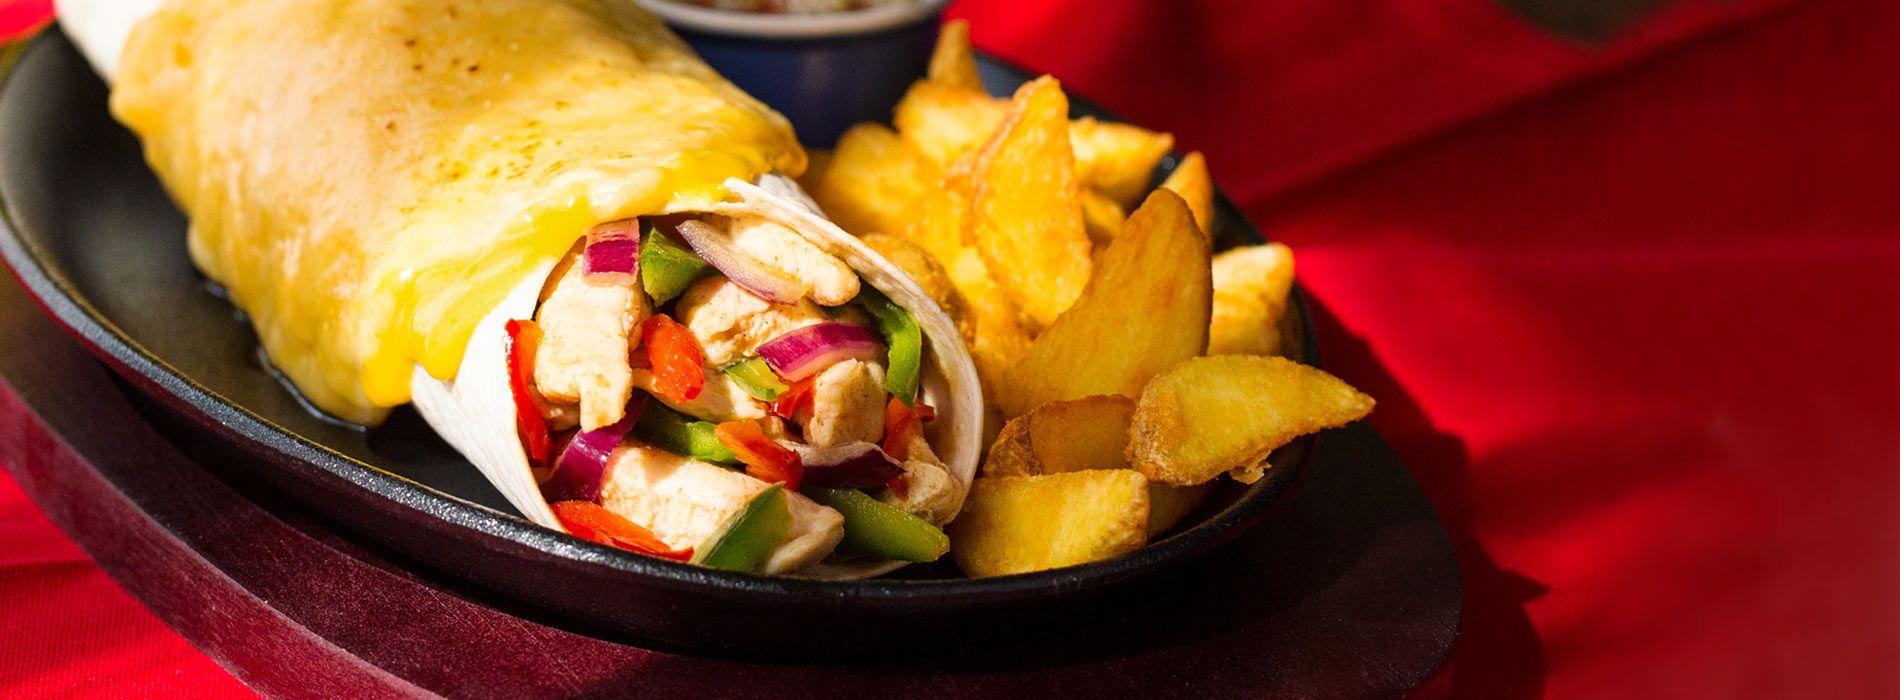 Elena Puyol, franquiciada de ComessGroup, afirma que 'la comida mexicana ha venido para quedarse?